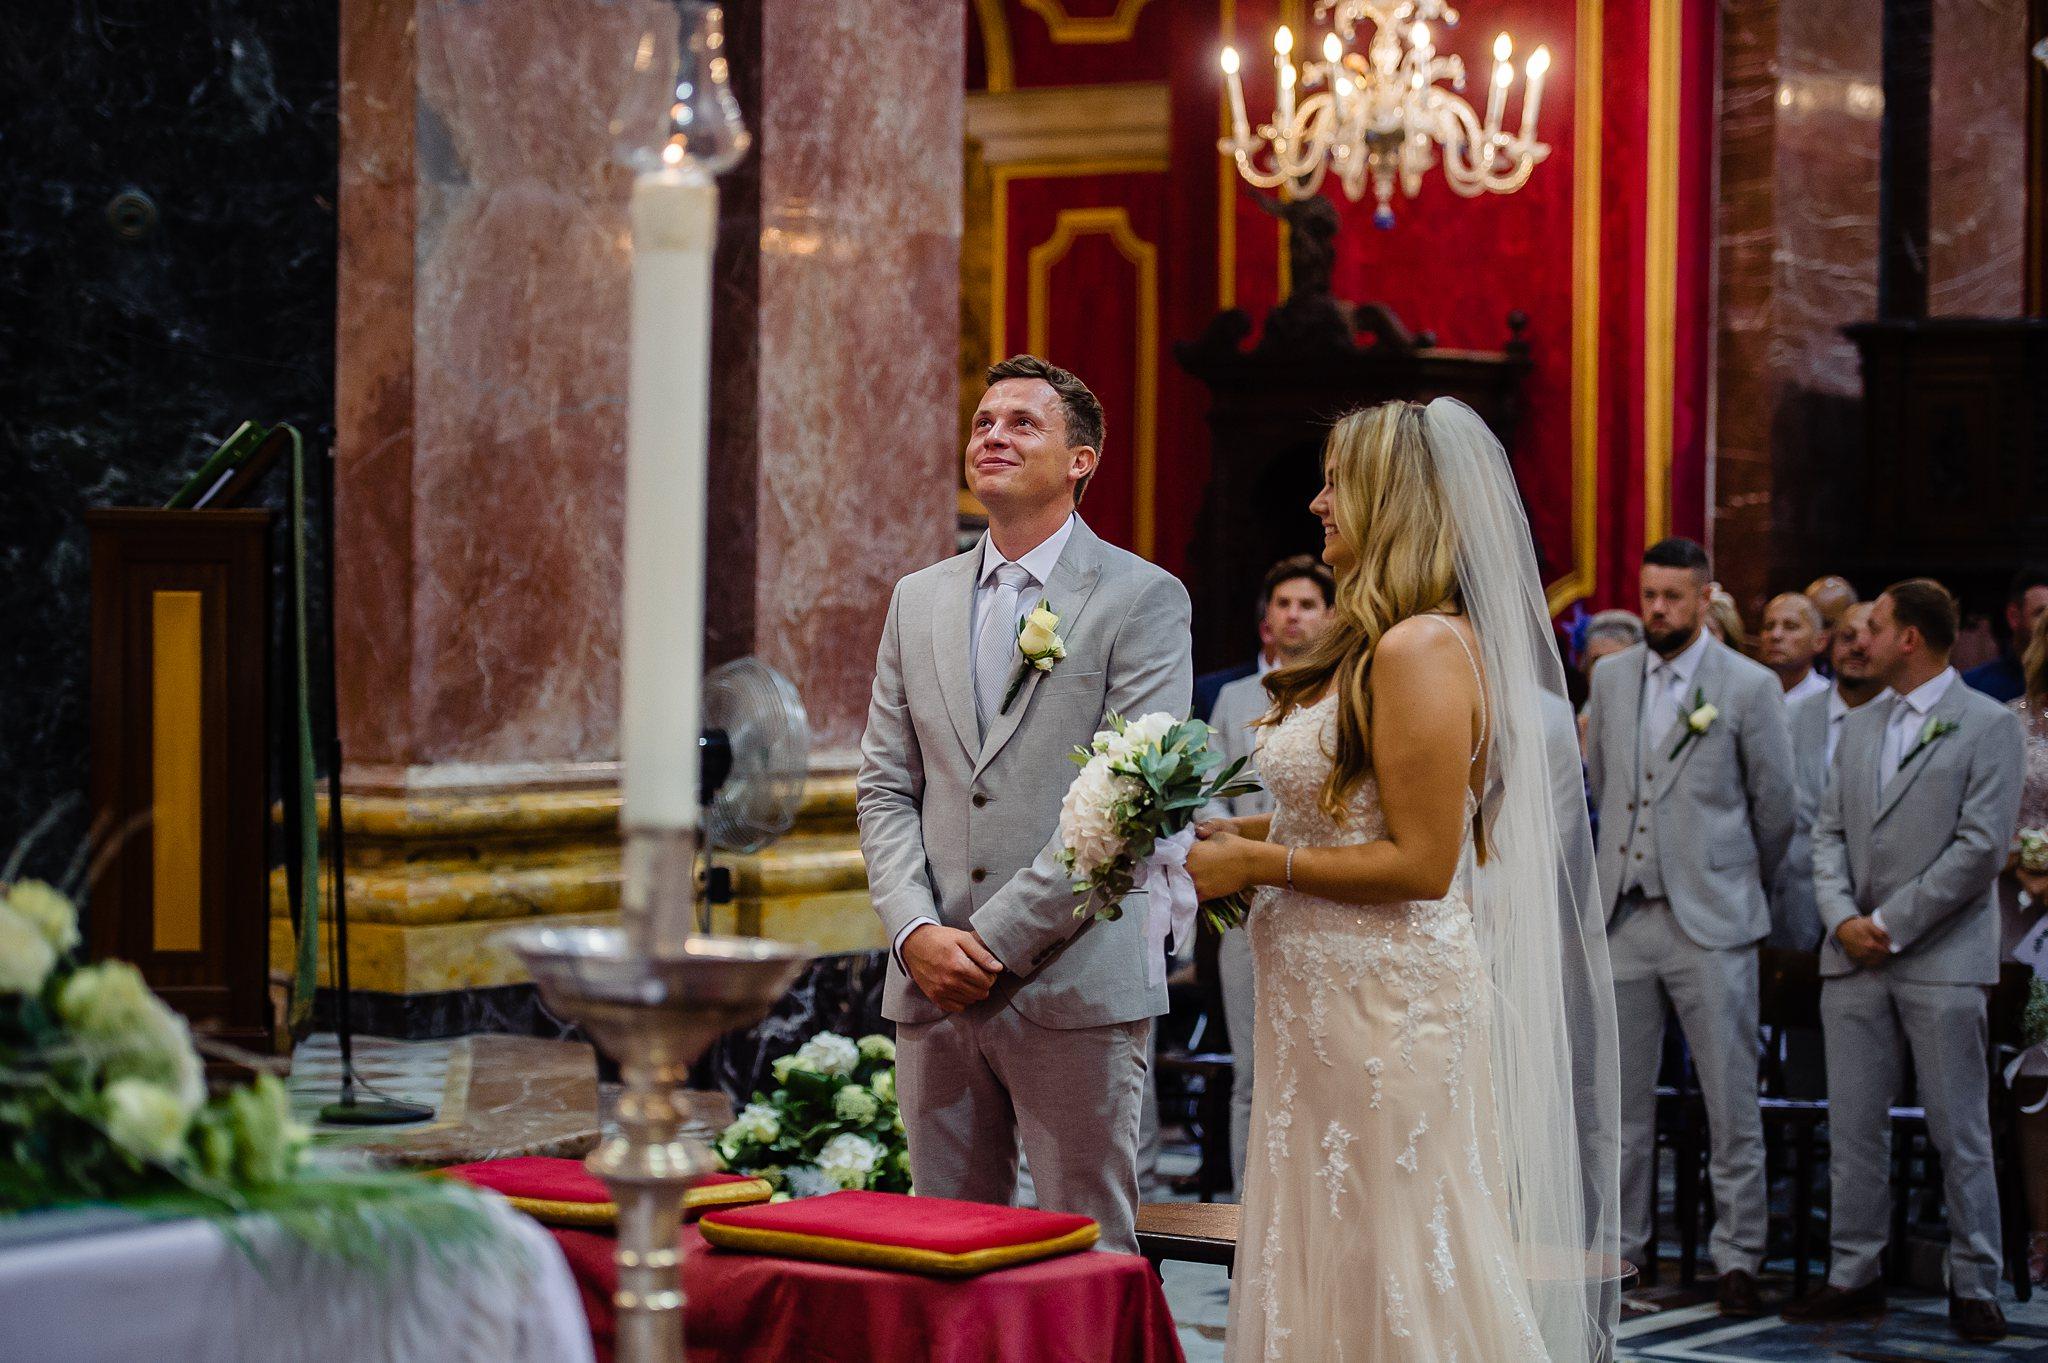 Harley & Jed | Olive Gardens Mdina | Wedding Photography Malta | Shane P. WattsHarley & Jed | Olive Gardens Mdina | Wedding Photography Malta | Shane P. Watts